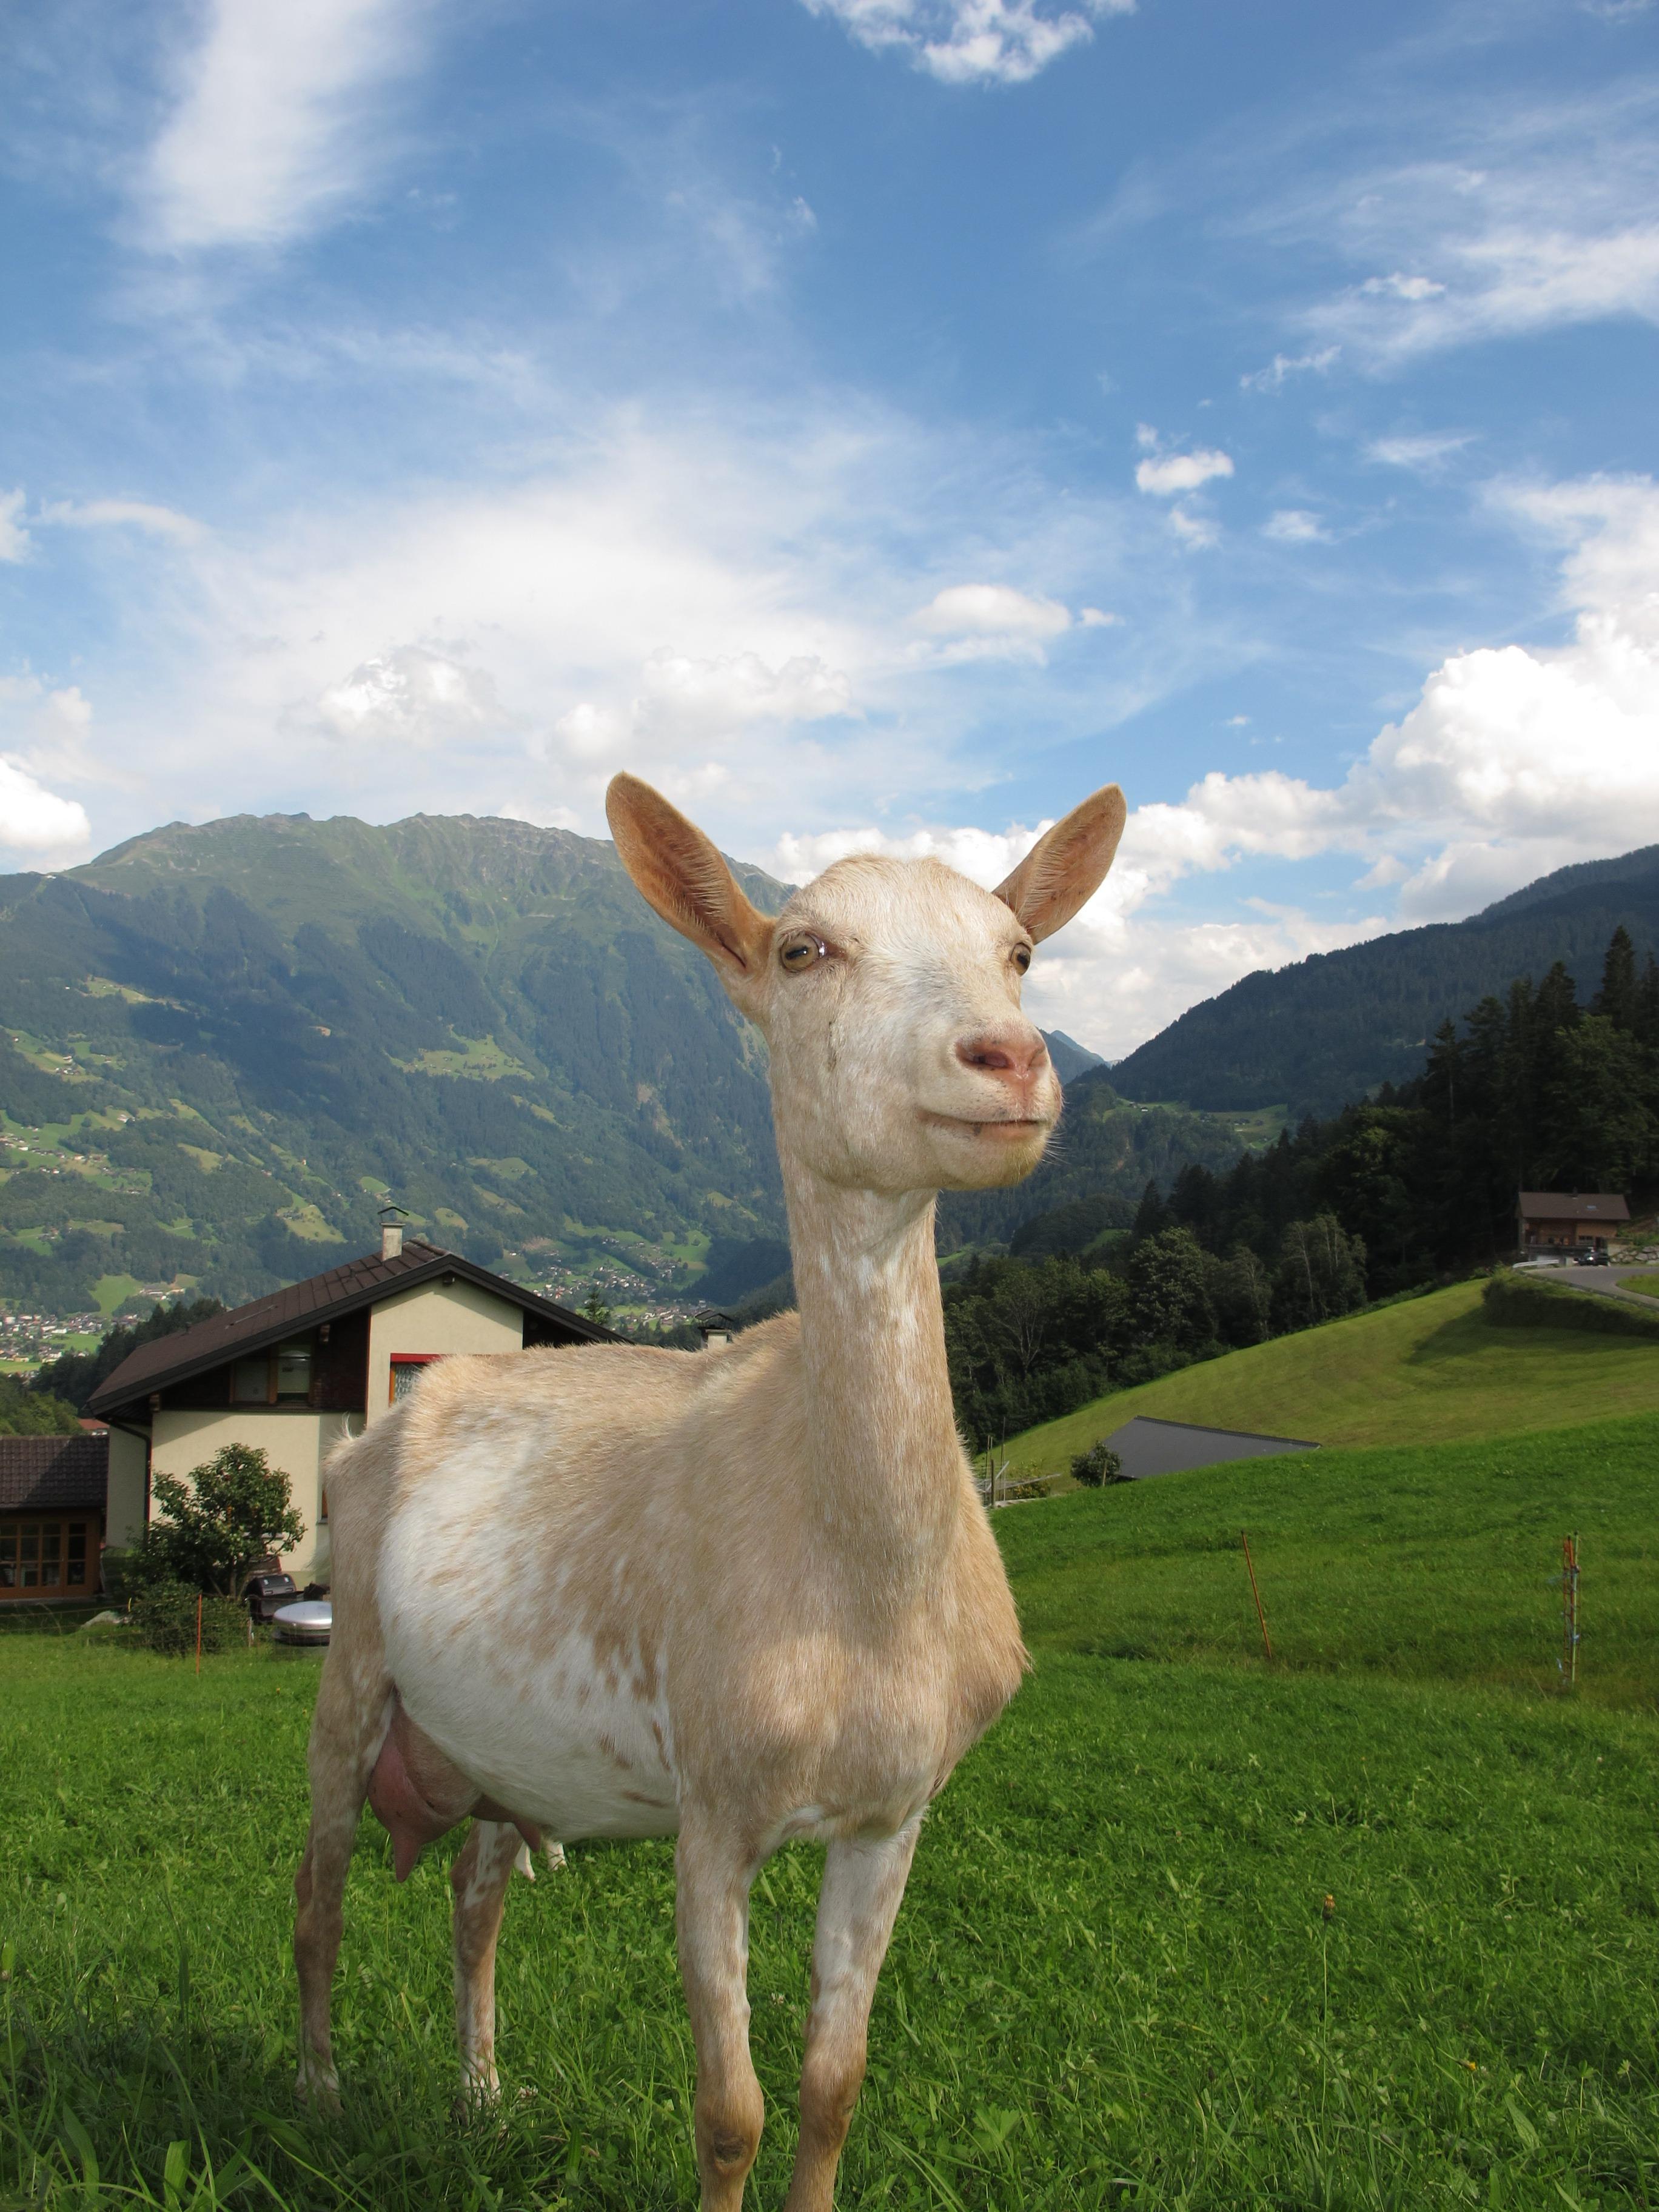 whit and beige goat  u00b7 free stock photo